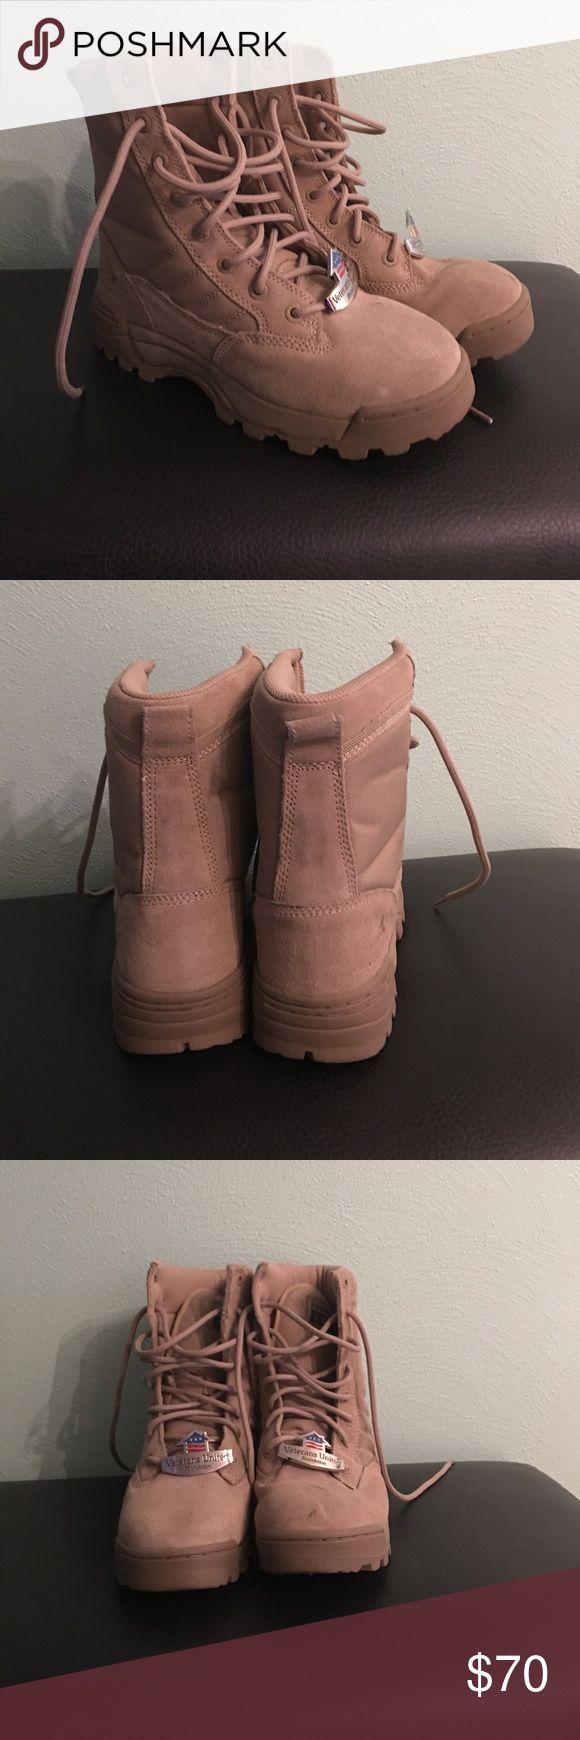 Original SWAT boots Nice boots orginal swat Shoes Boots